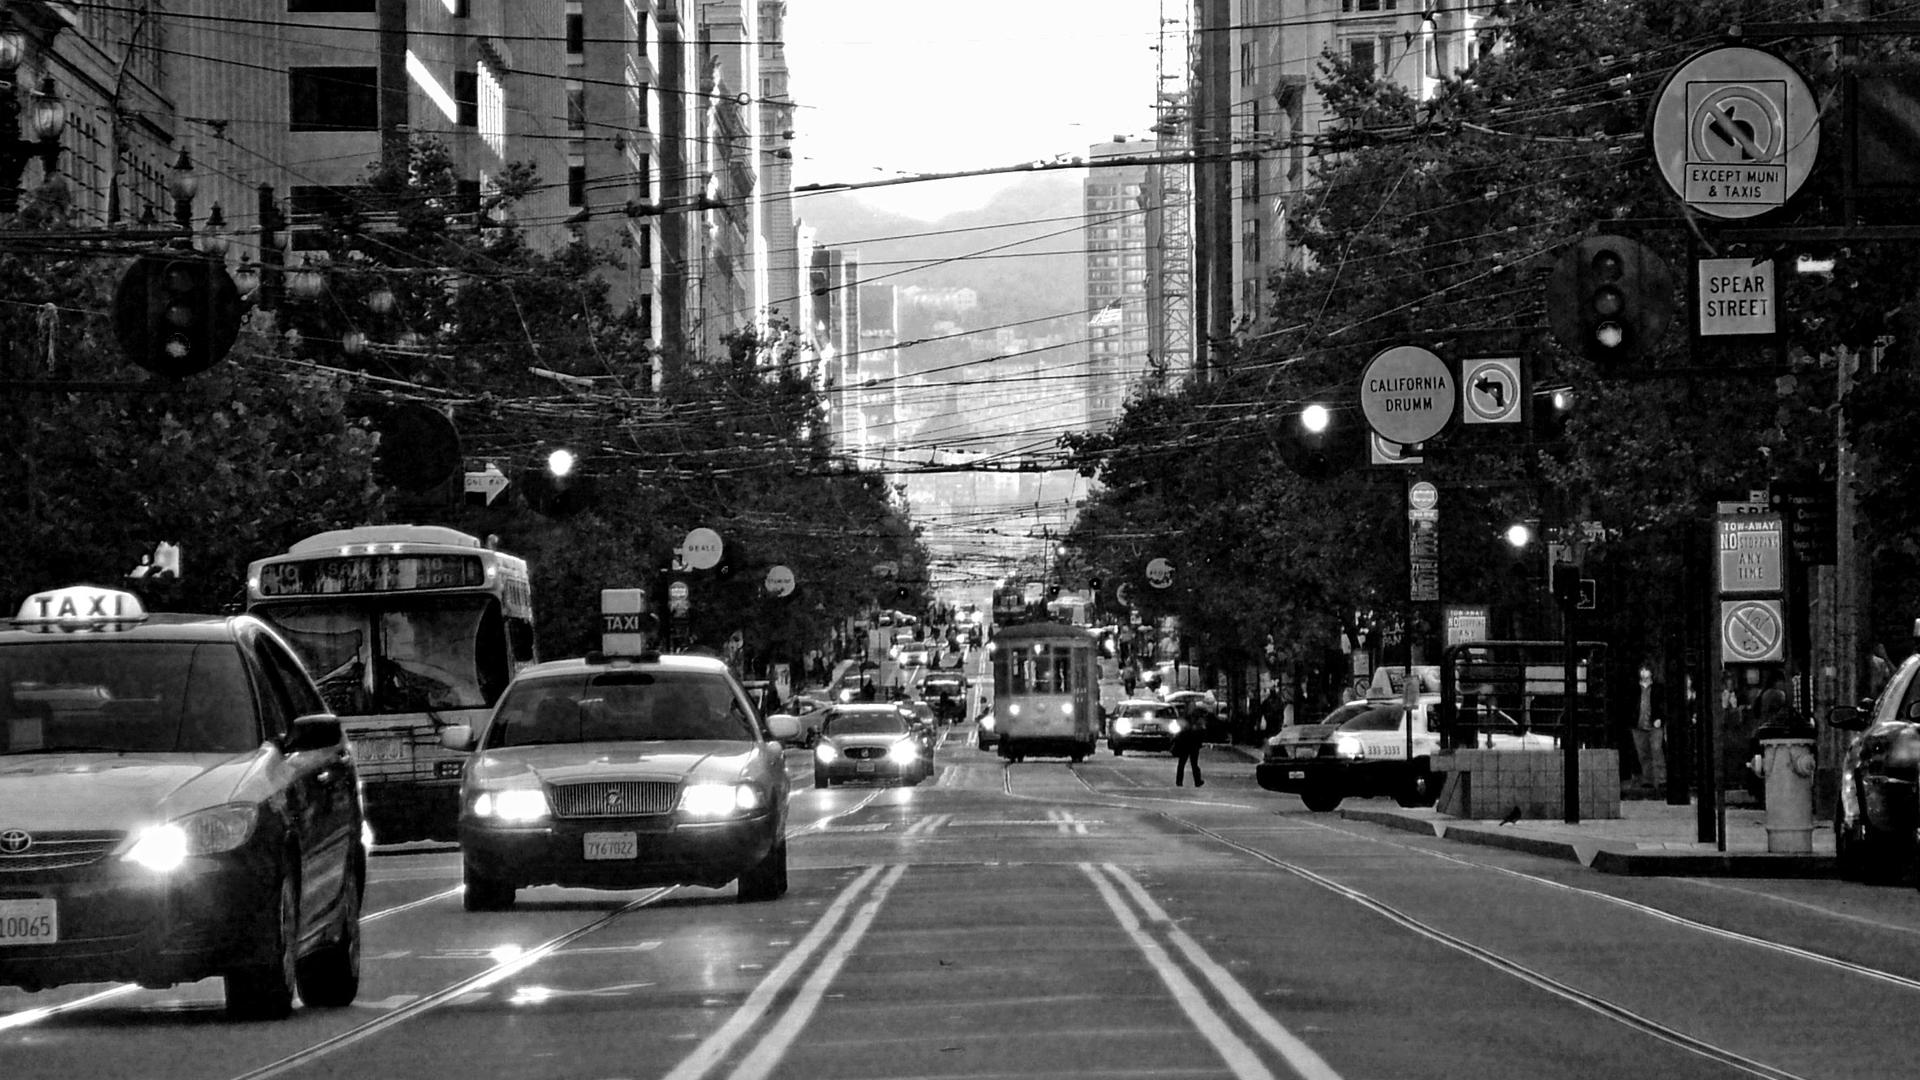 Download busy city wallpaper HD wallpaper 1920x1080